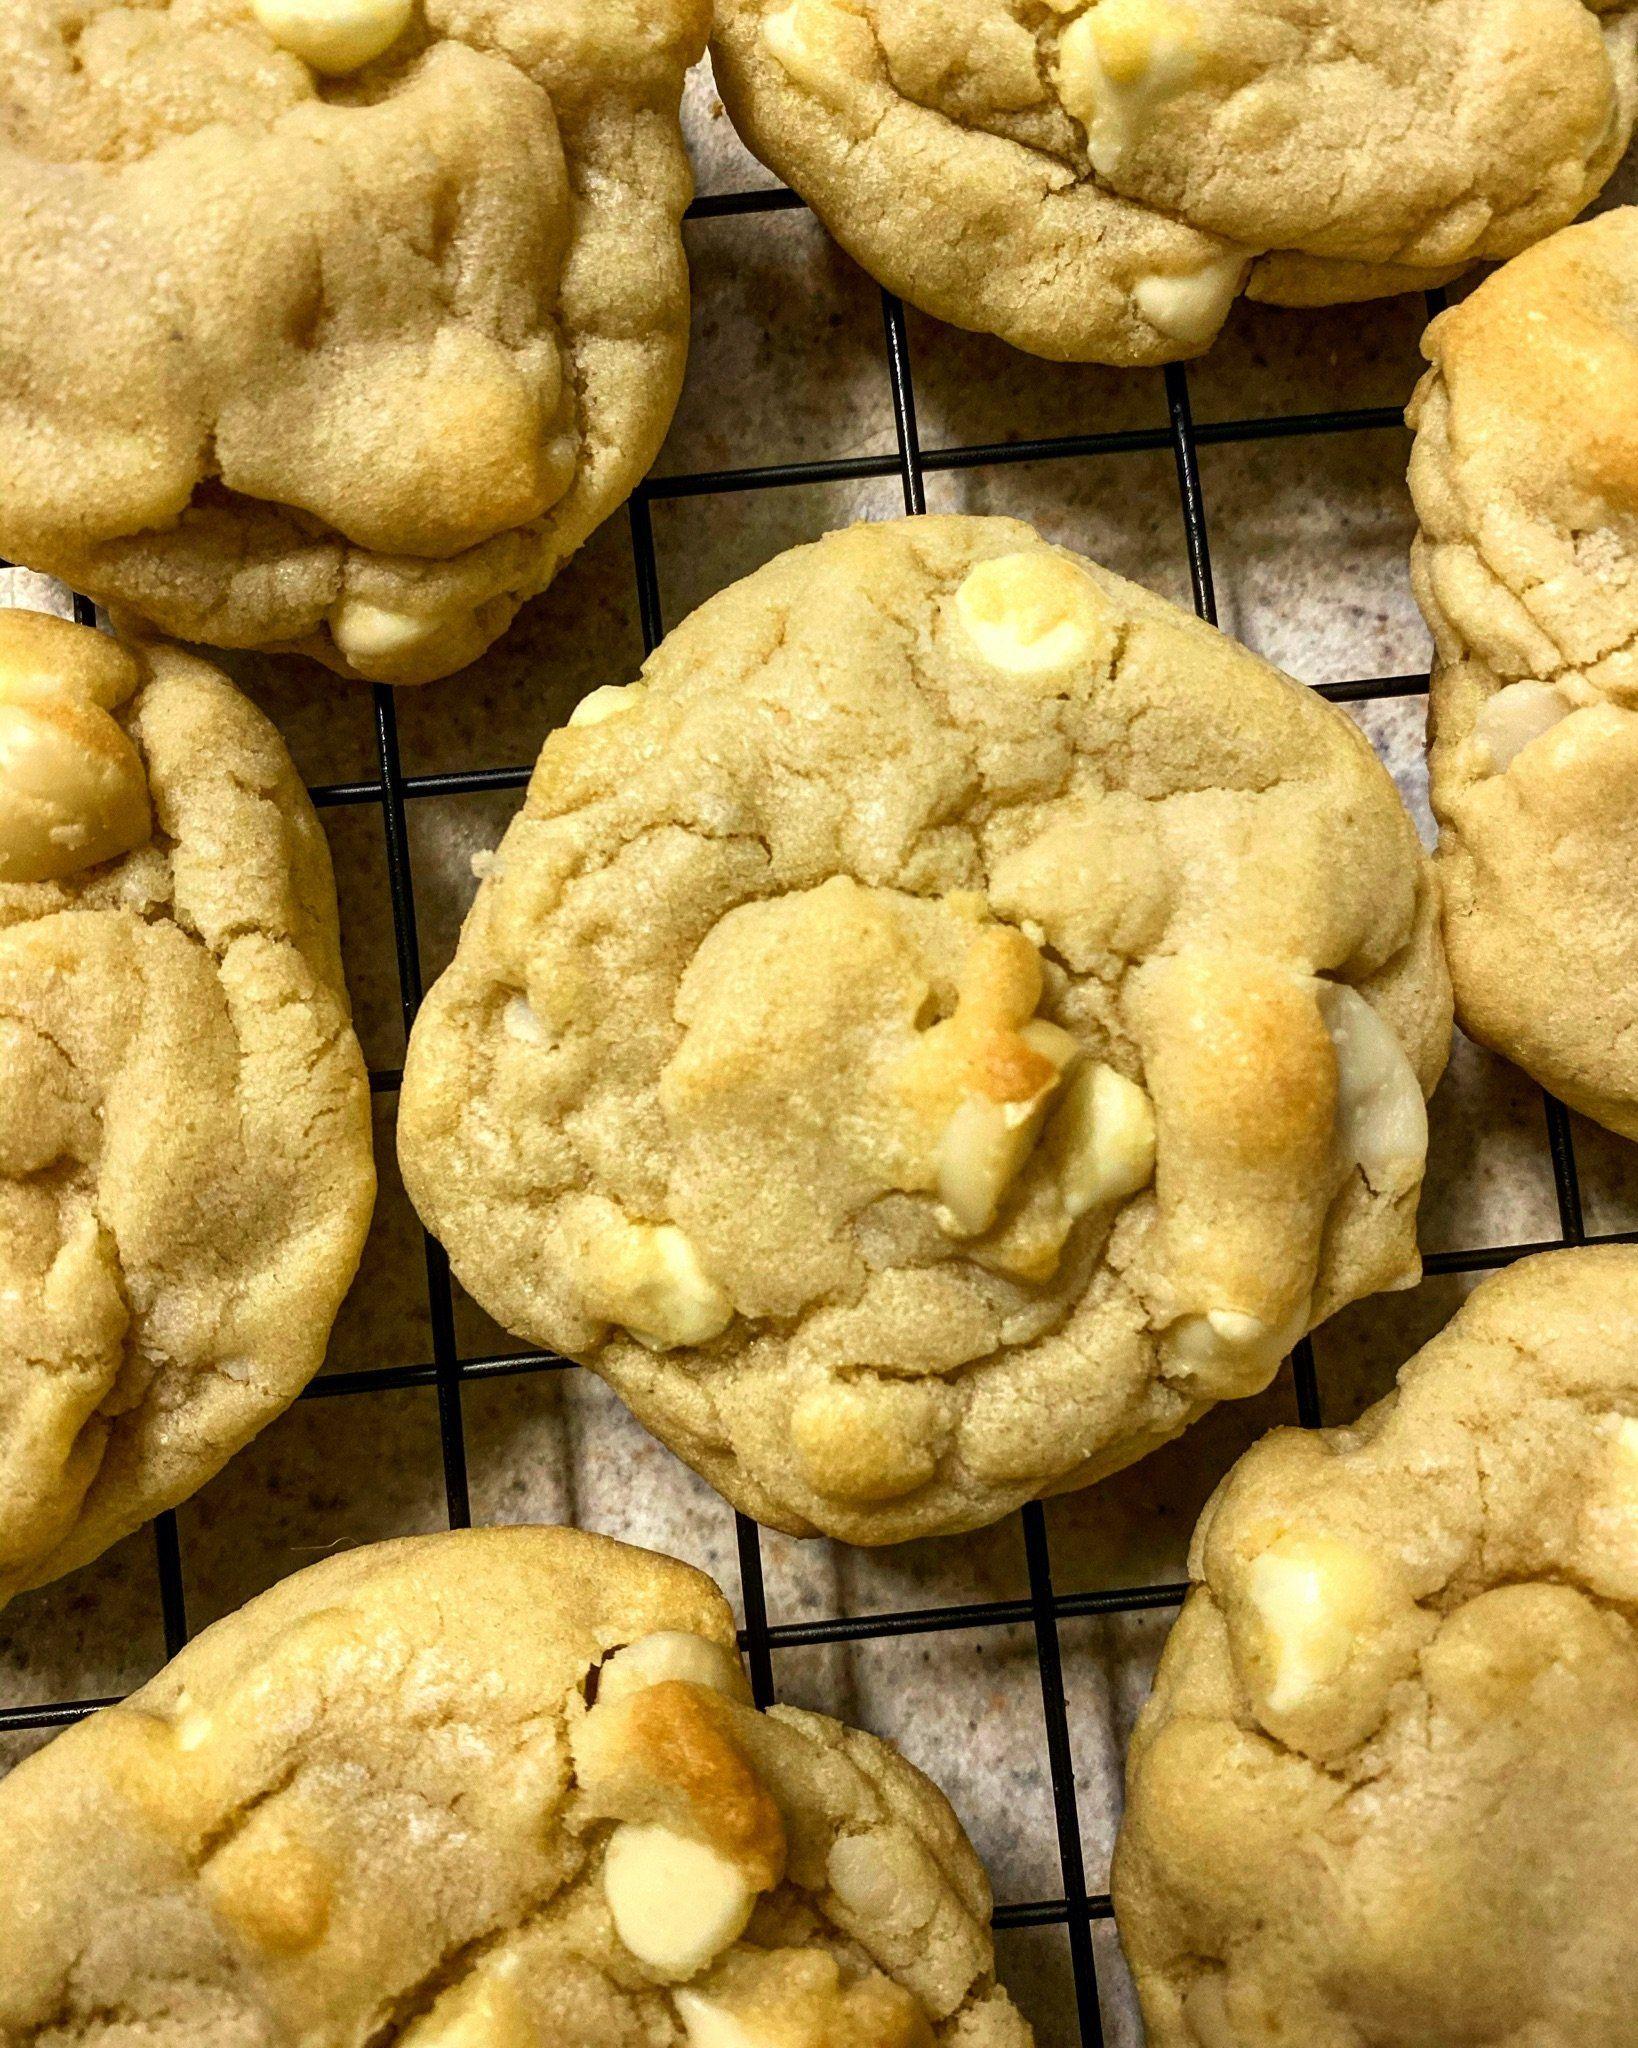 White Chocolate Macadamia Nut Cookies Subway Copycat Recipe White Chocolate Macadamia White Chocolate Macadamia Nut Cookies Macadamia Nut Cookies